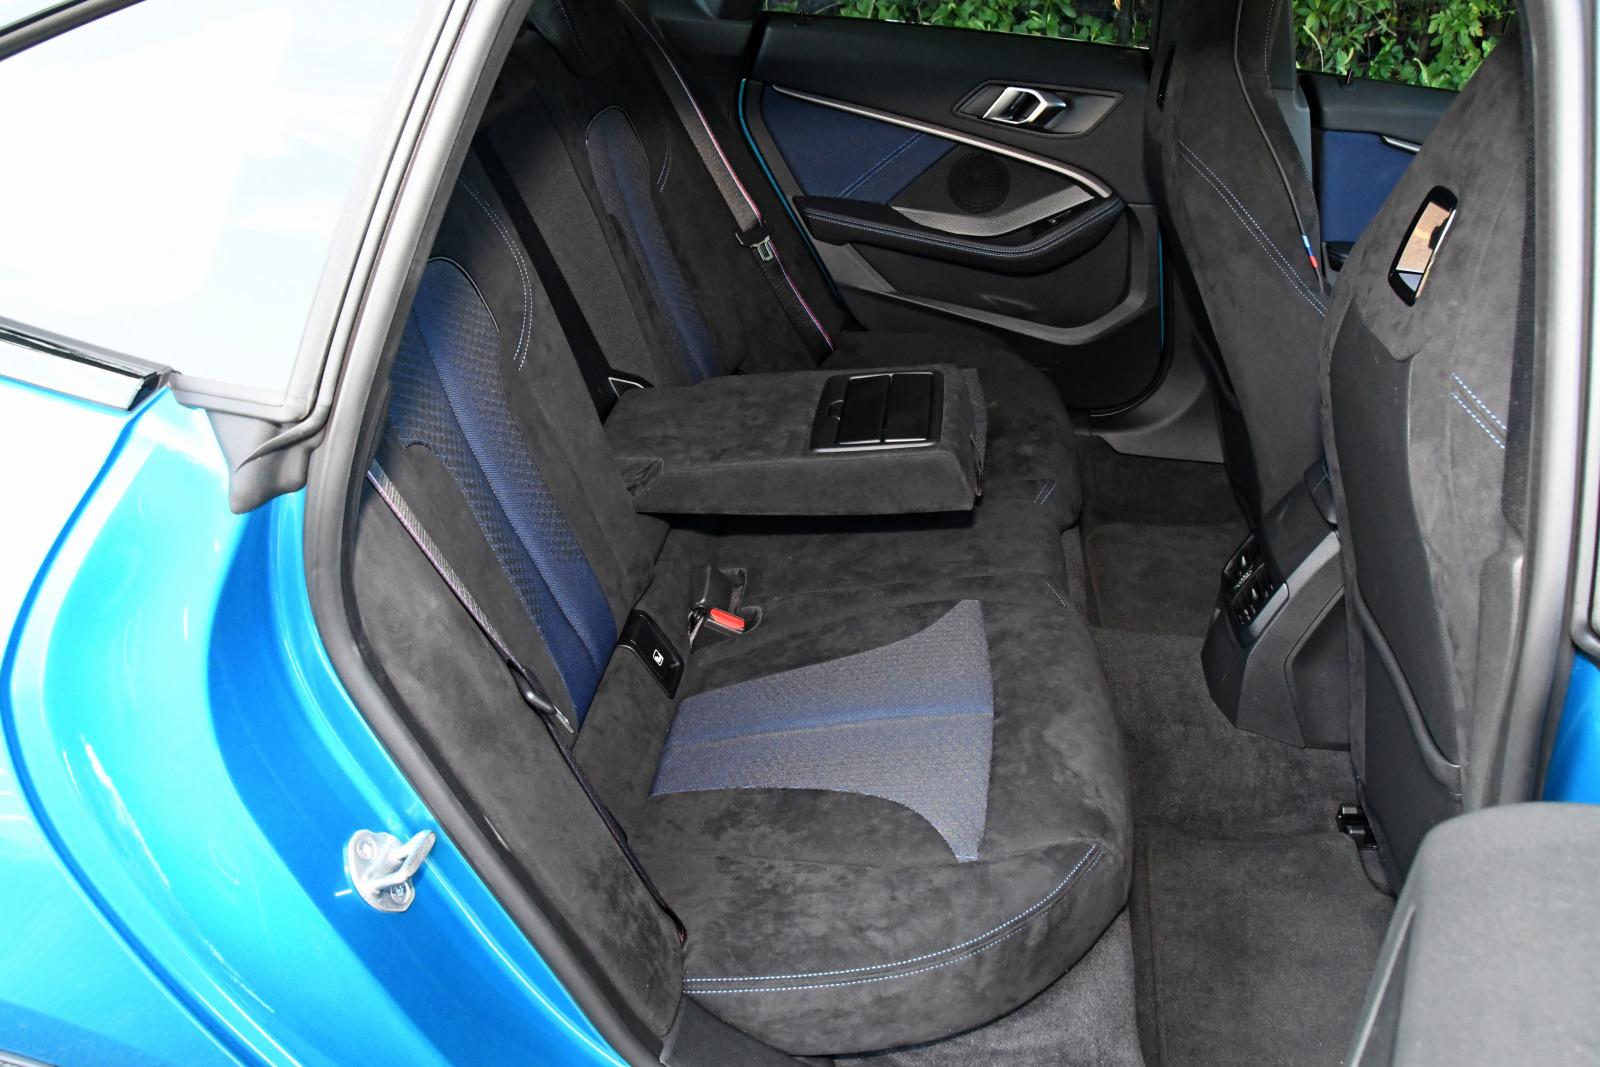 「FFベース4WDの味付けに開眼したBMW 【BMW M235i Xドライブ グランクーペ試乗】」の6枚目の画像